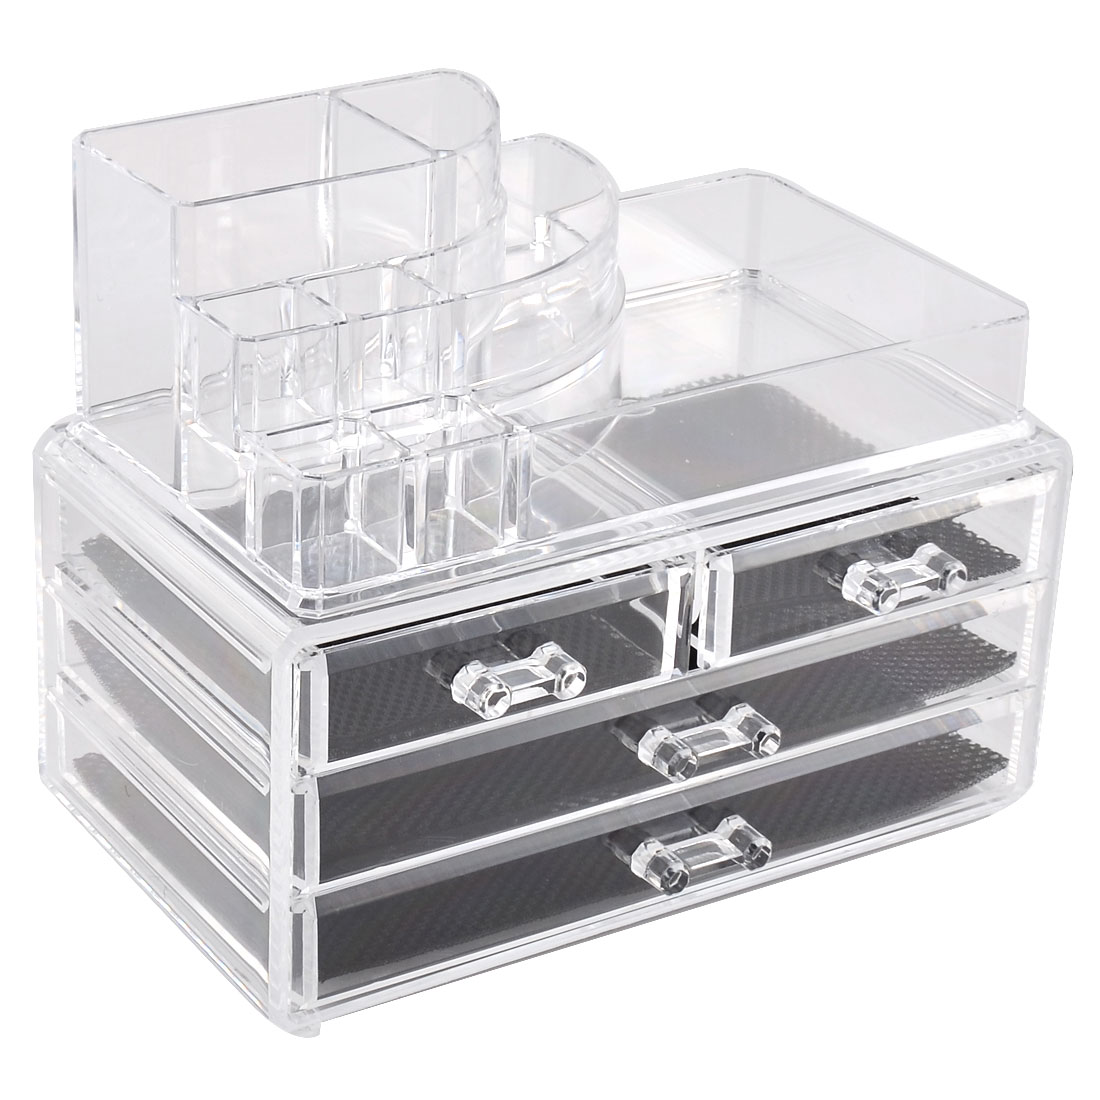 Acrylic Cosmetics Storage Case Display Box Jewelry Holder Organizer Set 2 in 1